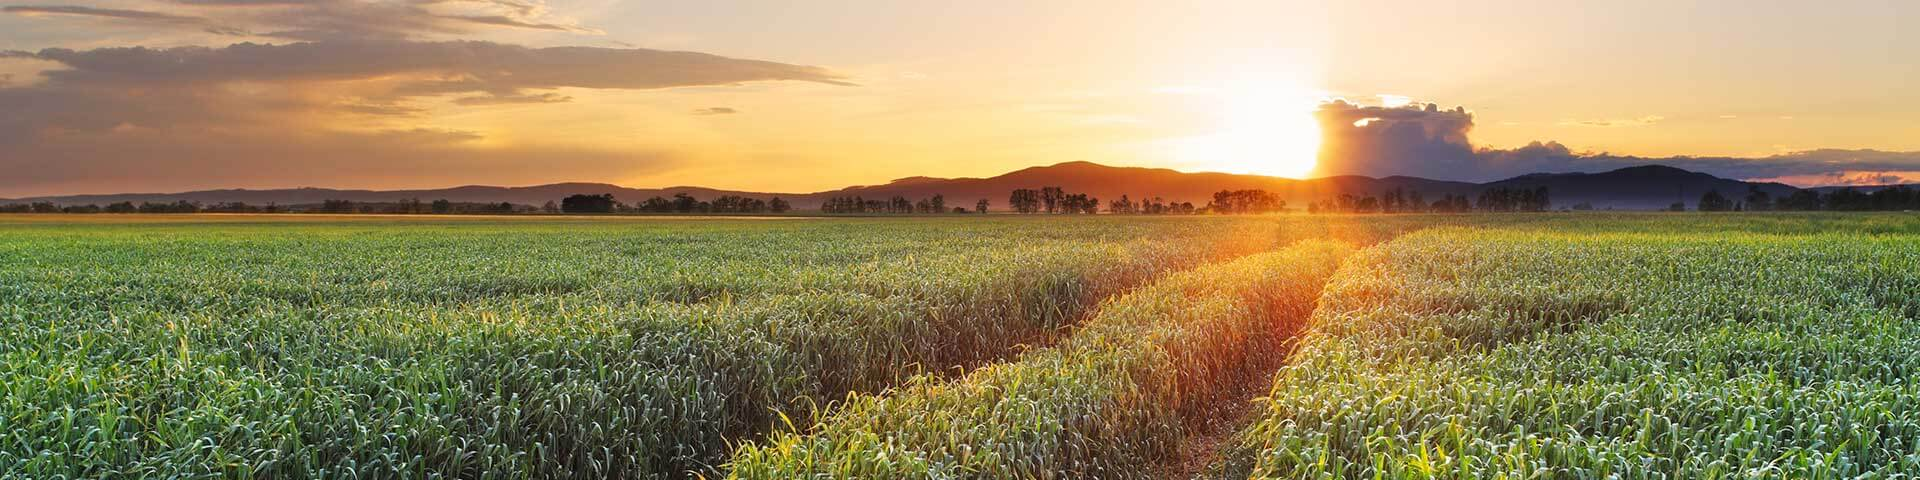 corn field at sunrise